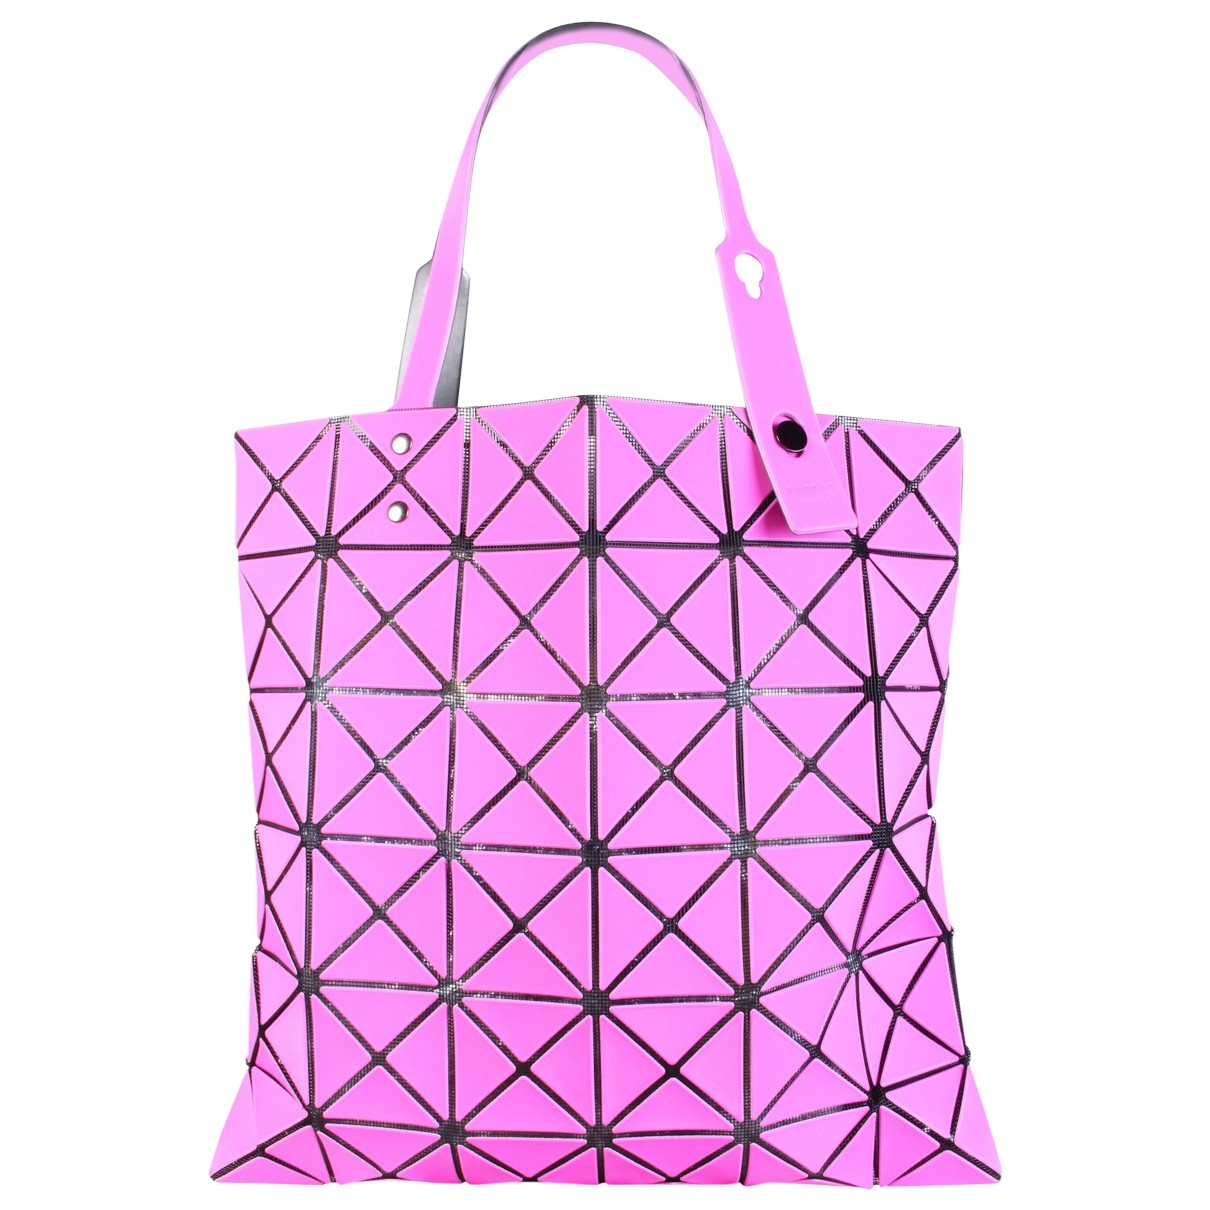 Issey Miyake \N Handtasche in  Rosa Synthetik